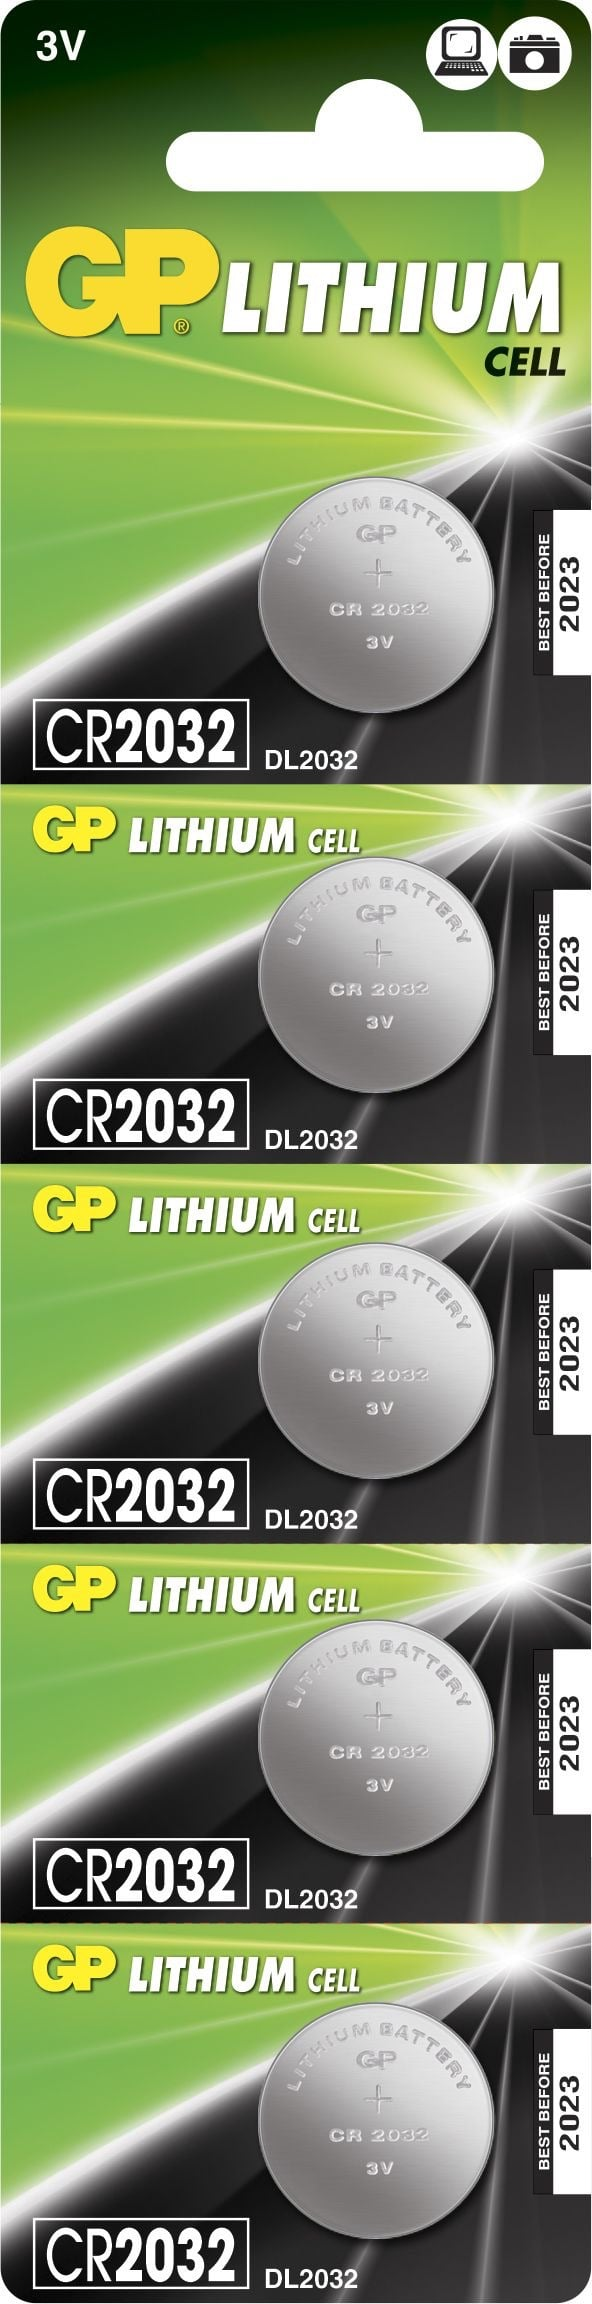 [tag] 5 stk. CR2032 3 Volt Lithium batteri Knapbatterier (3V)